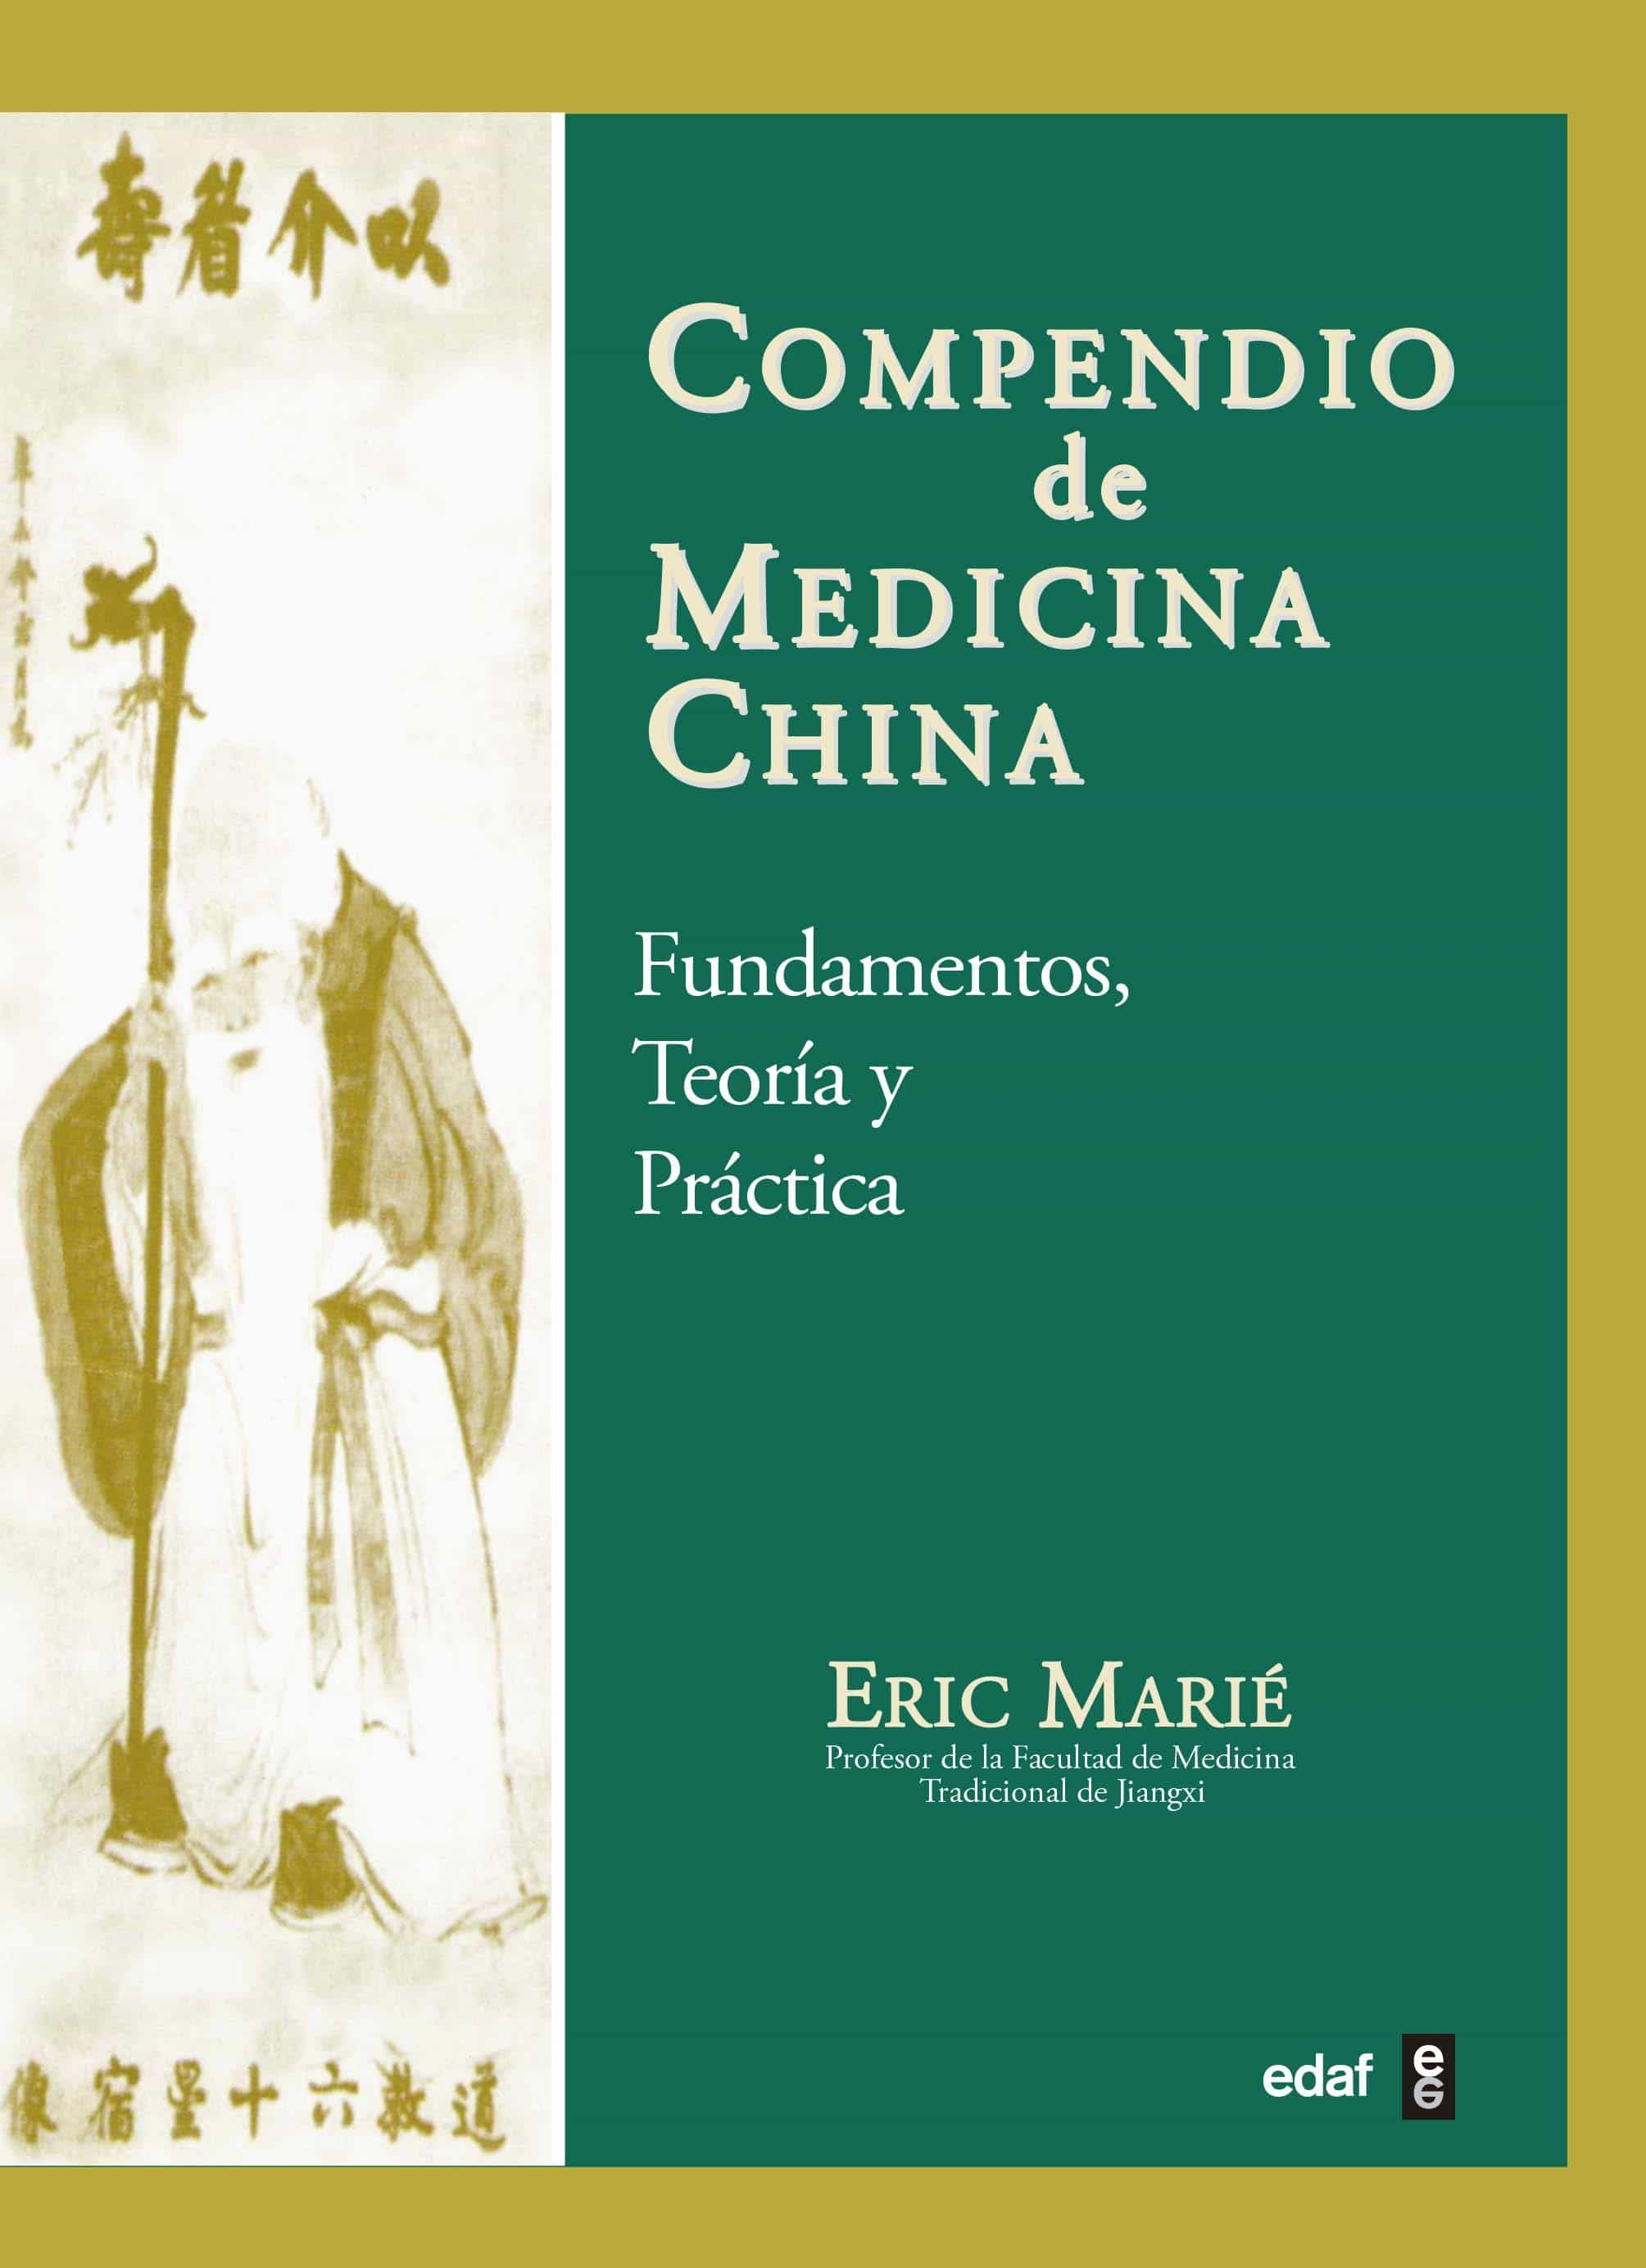 compendio de medicina china-eric marie-9788441403031